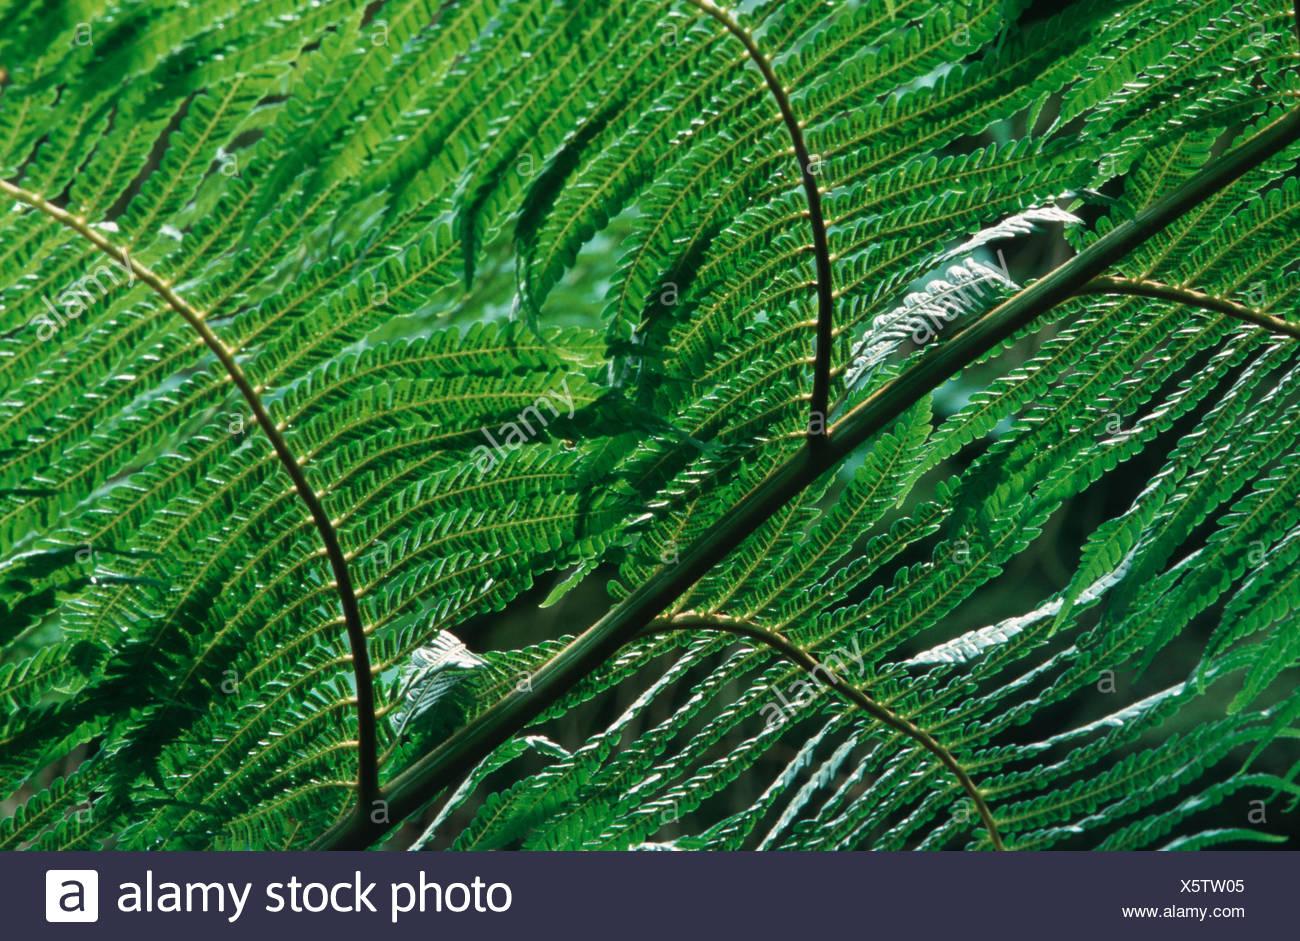 Cooper's cyathea, Australian tree fern, lacy tree fern, scaly tree fern (Cyathea cooperi, Sphaeropteris cooperi, Alsophila cooperi), view on the underside of a frond - Stock Image